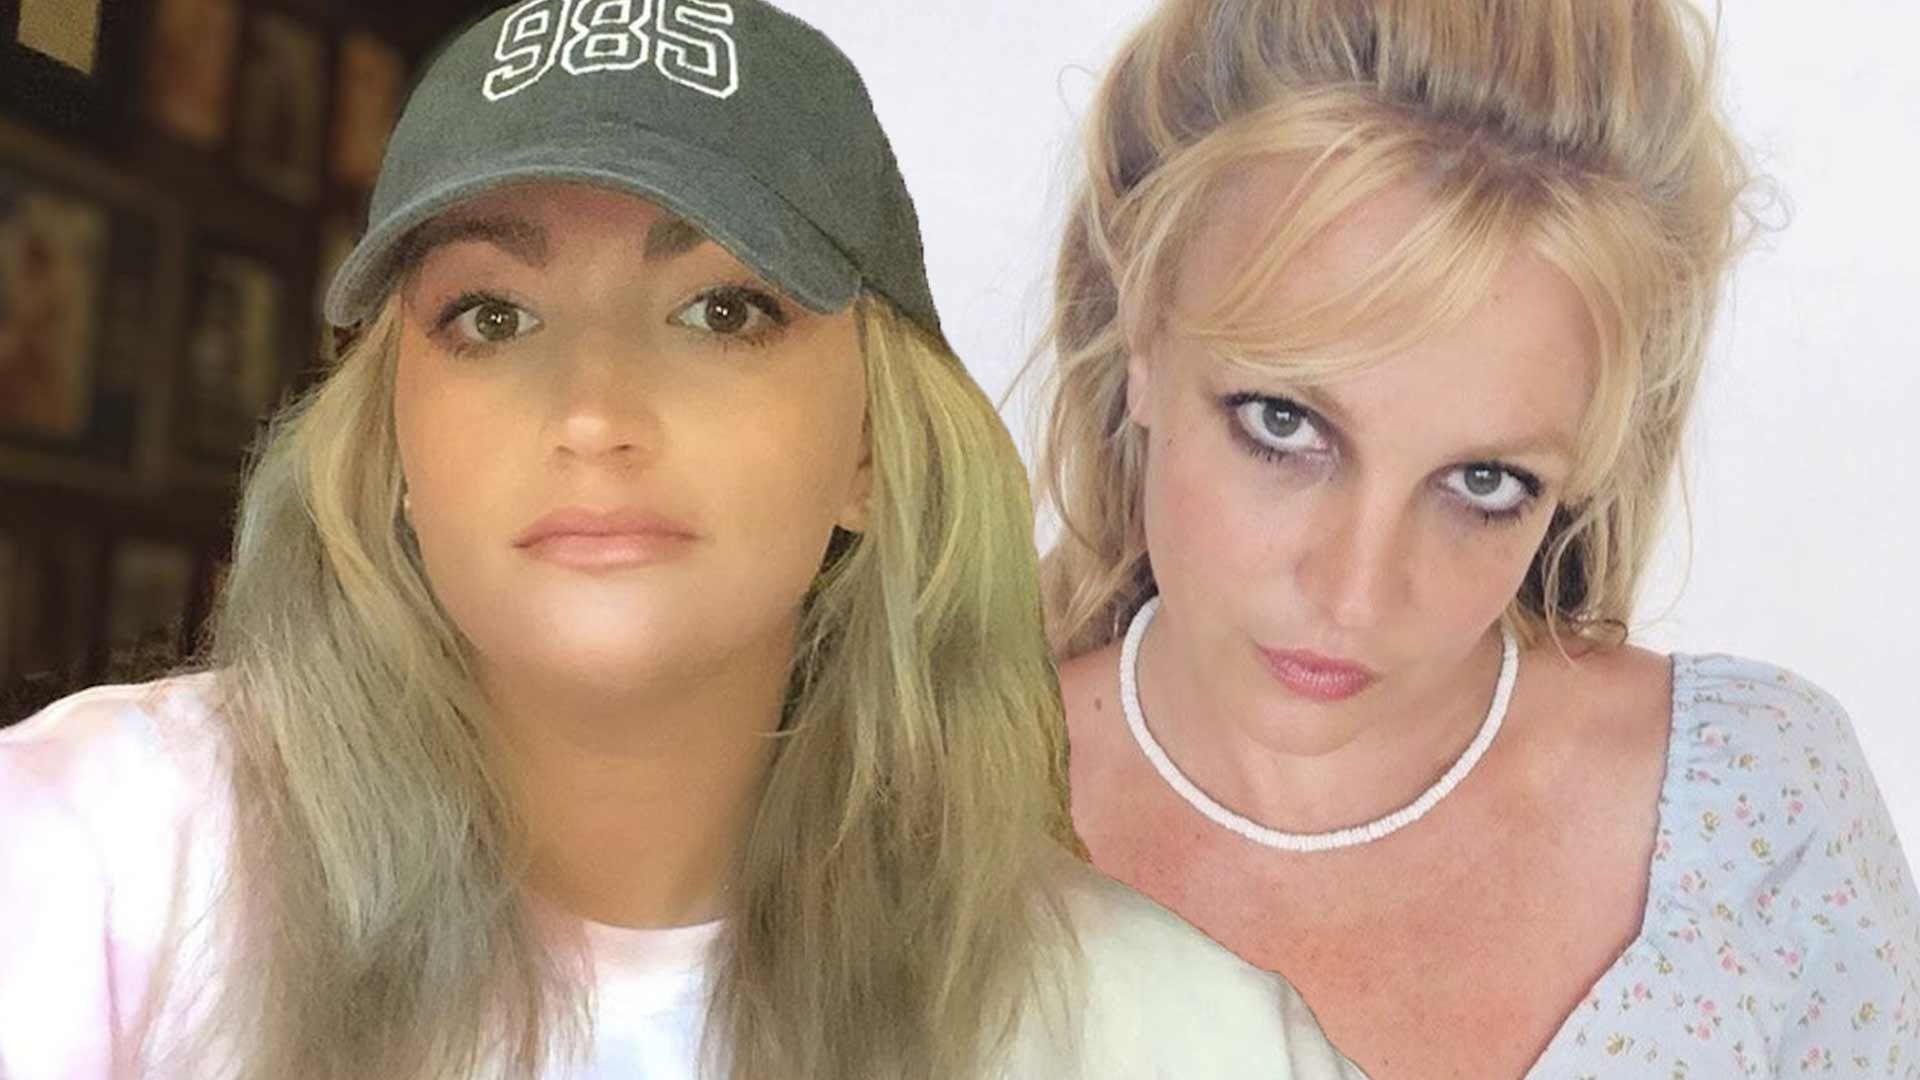 Jamie Lynn Spears Doubles Down On Defending Britney Spears Mental Health